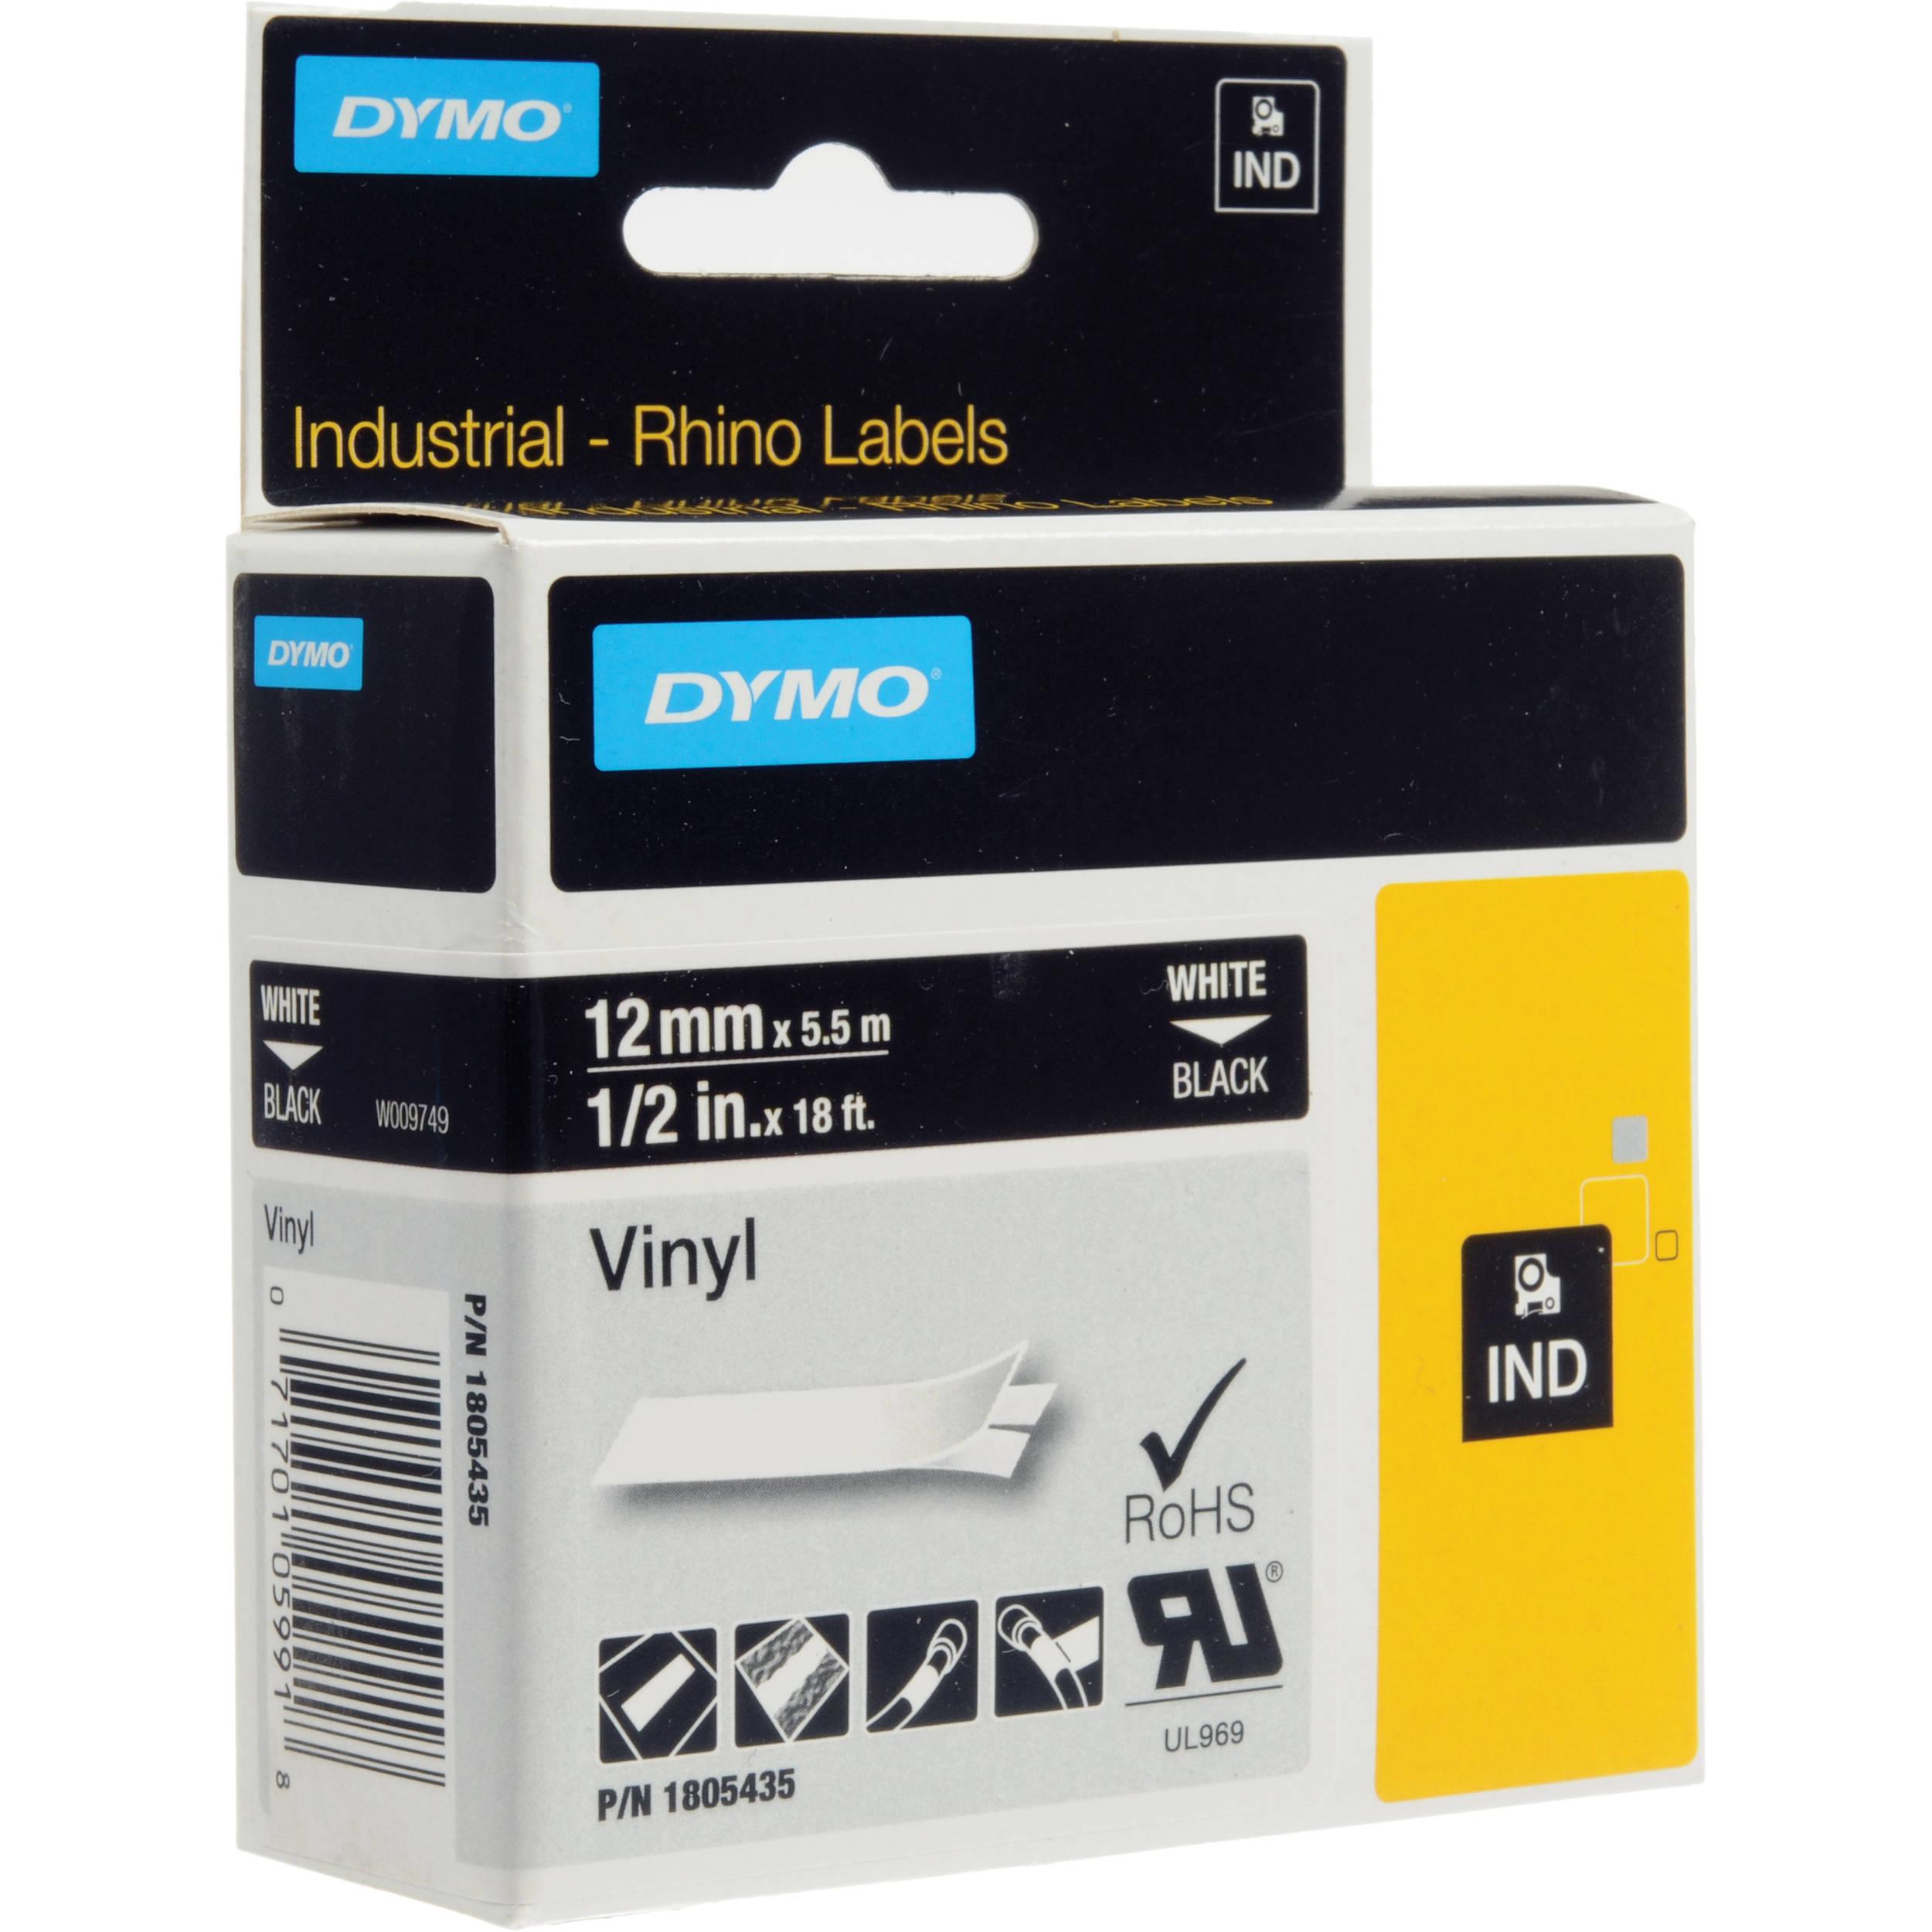 dymo rhino 1 2 black vinyl labels white print 1805435. Black Bedroom Furniture Sets. Home Design Ideas